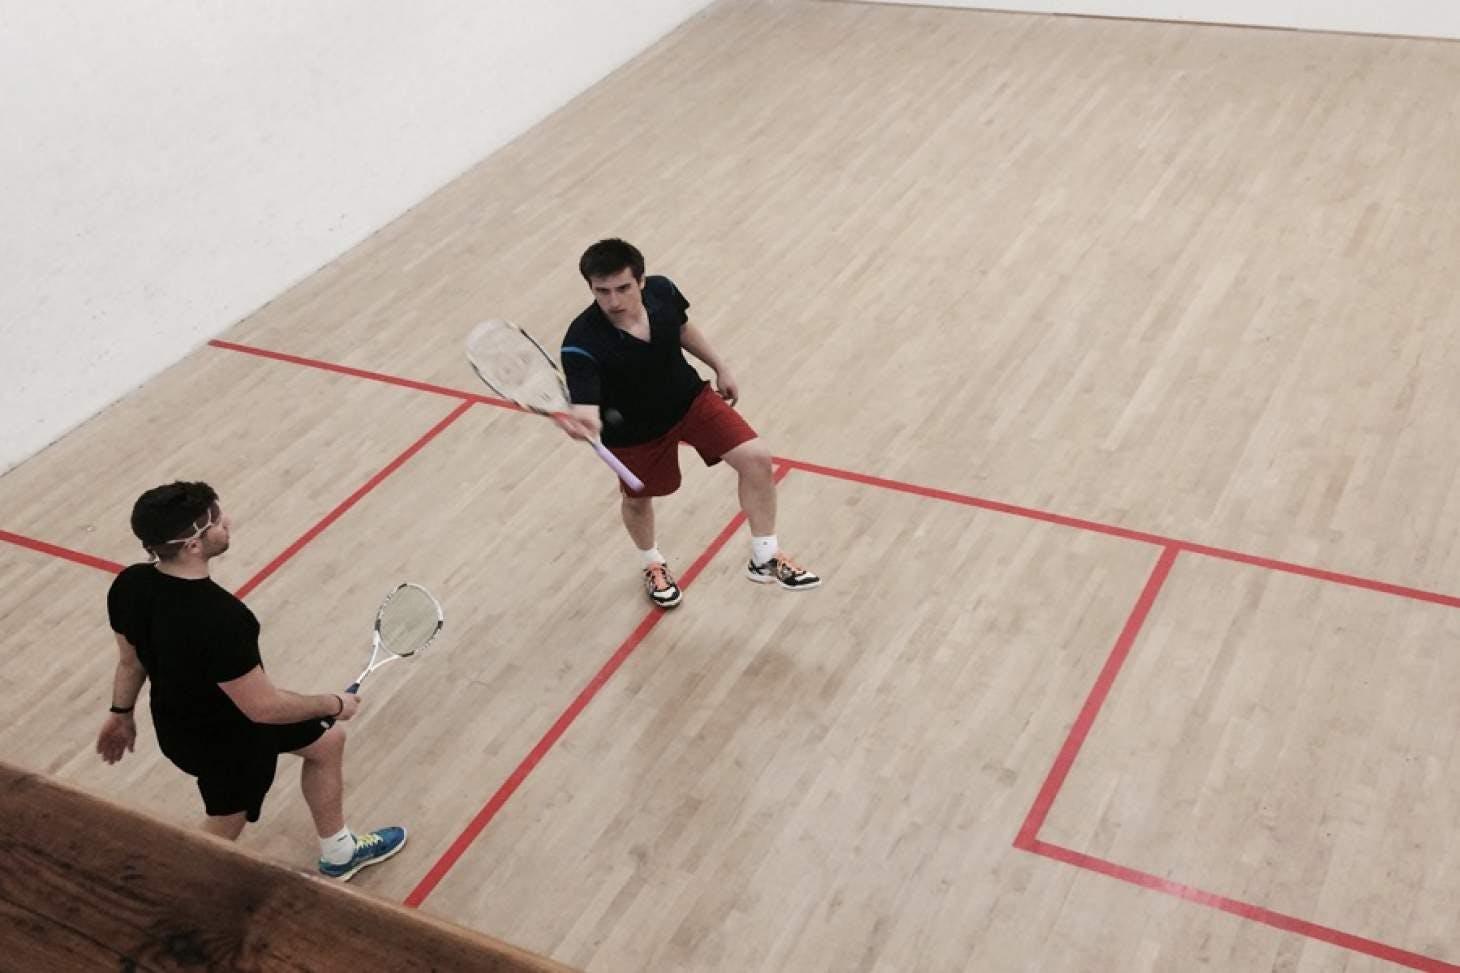 Grafton Lawn Tennis Club Indoor | Hard squash court